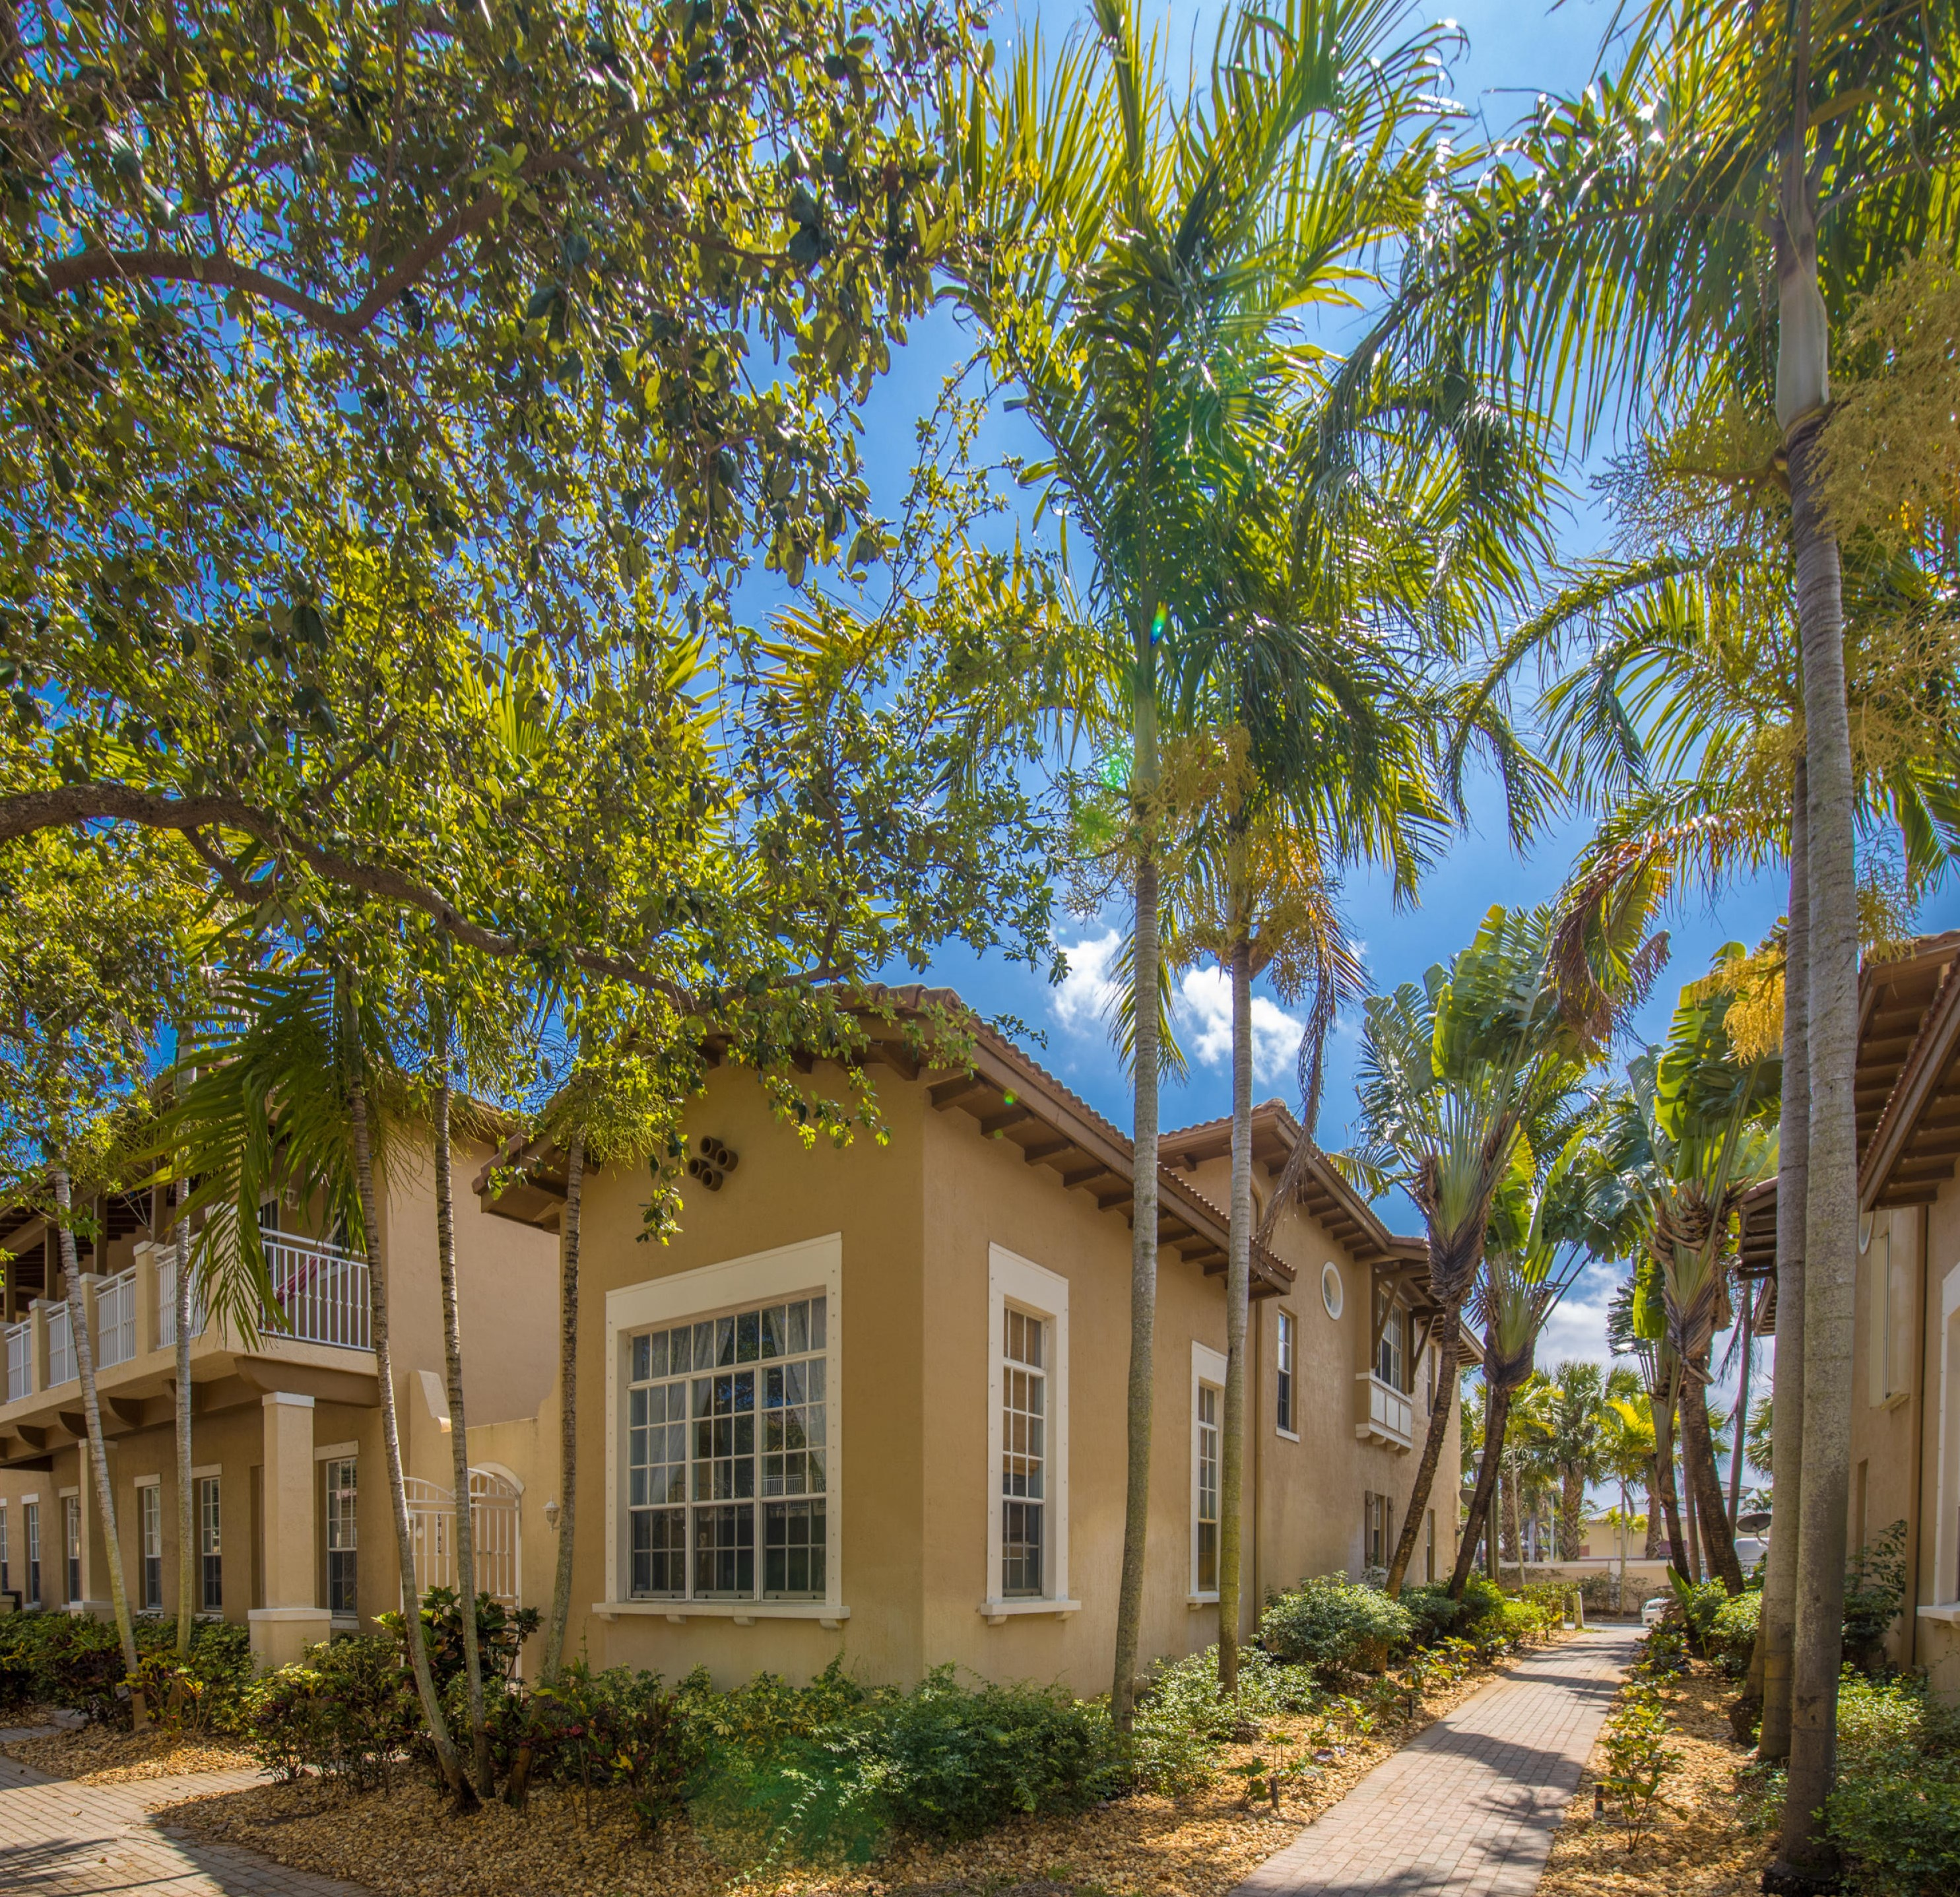 610 Nw 24th Ave, Boynton Beach, FL 33426